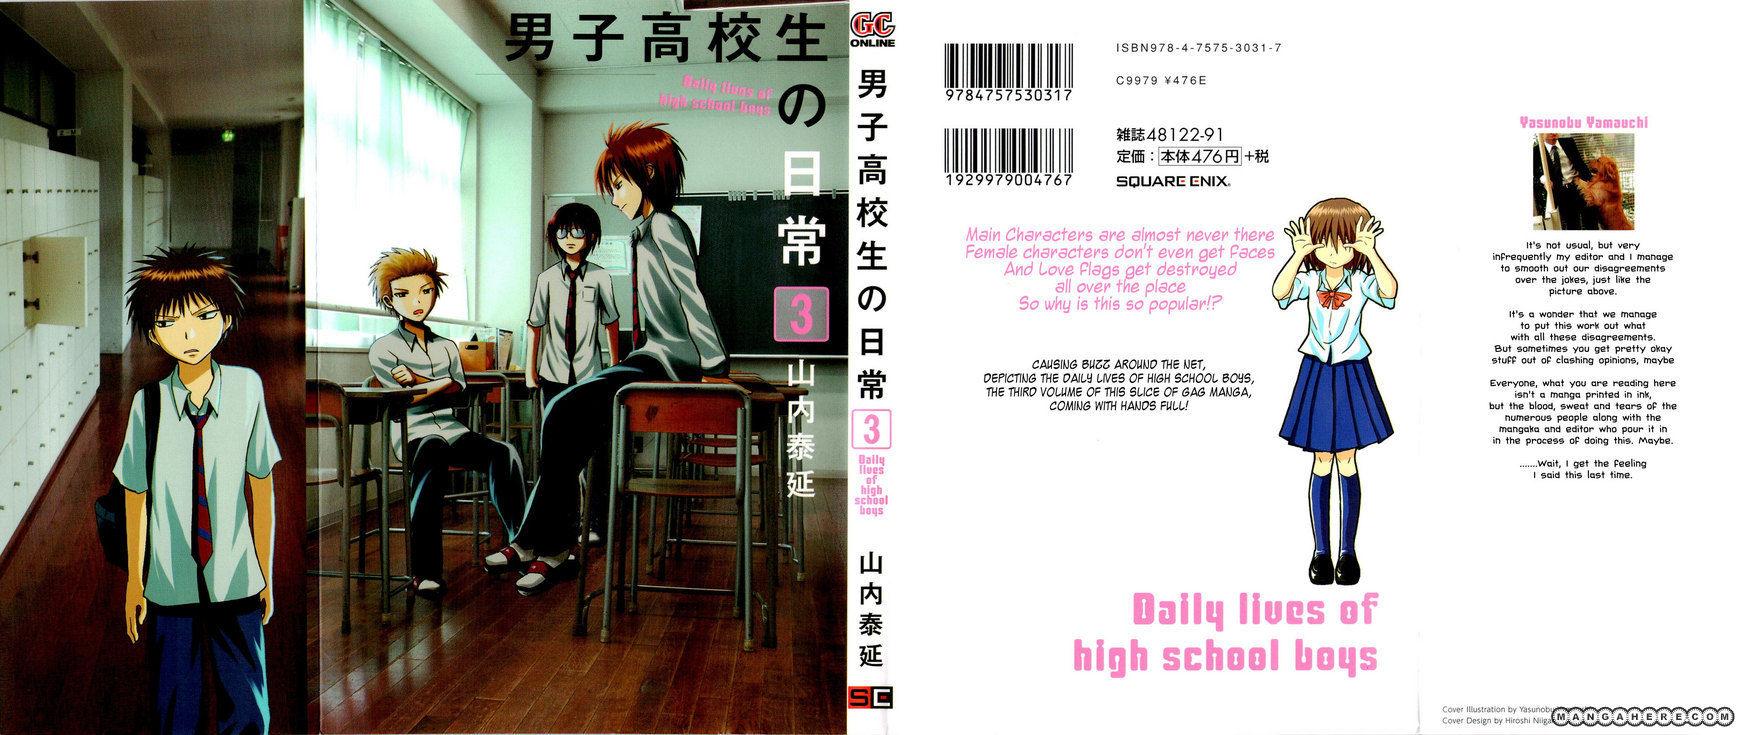 Danshi Koukousei no Nichijou 33 Page 1